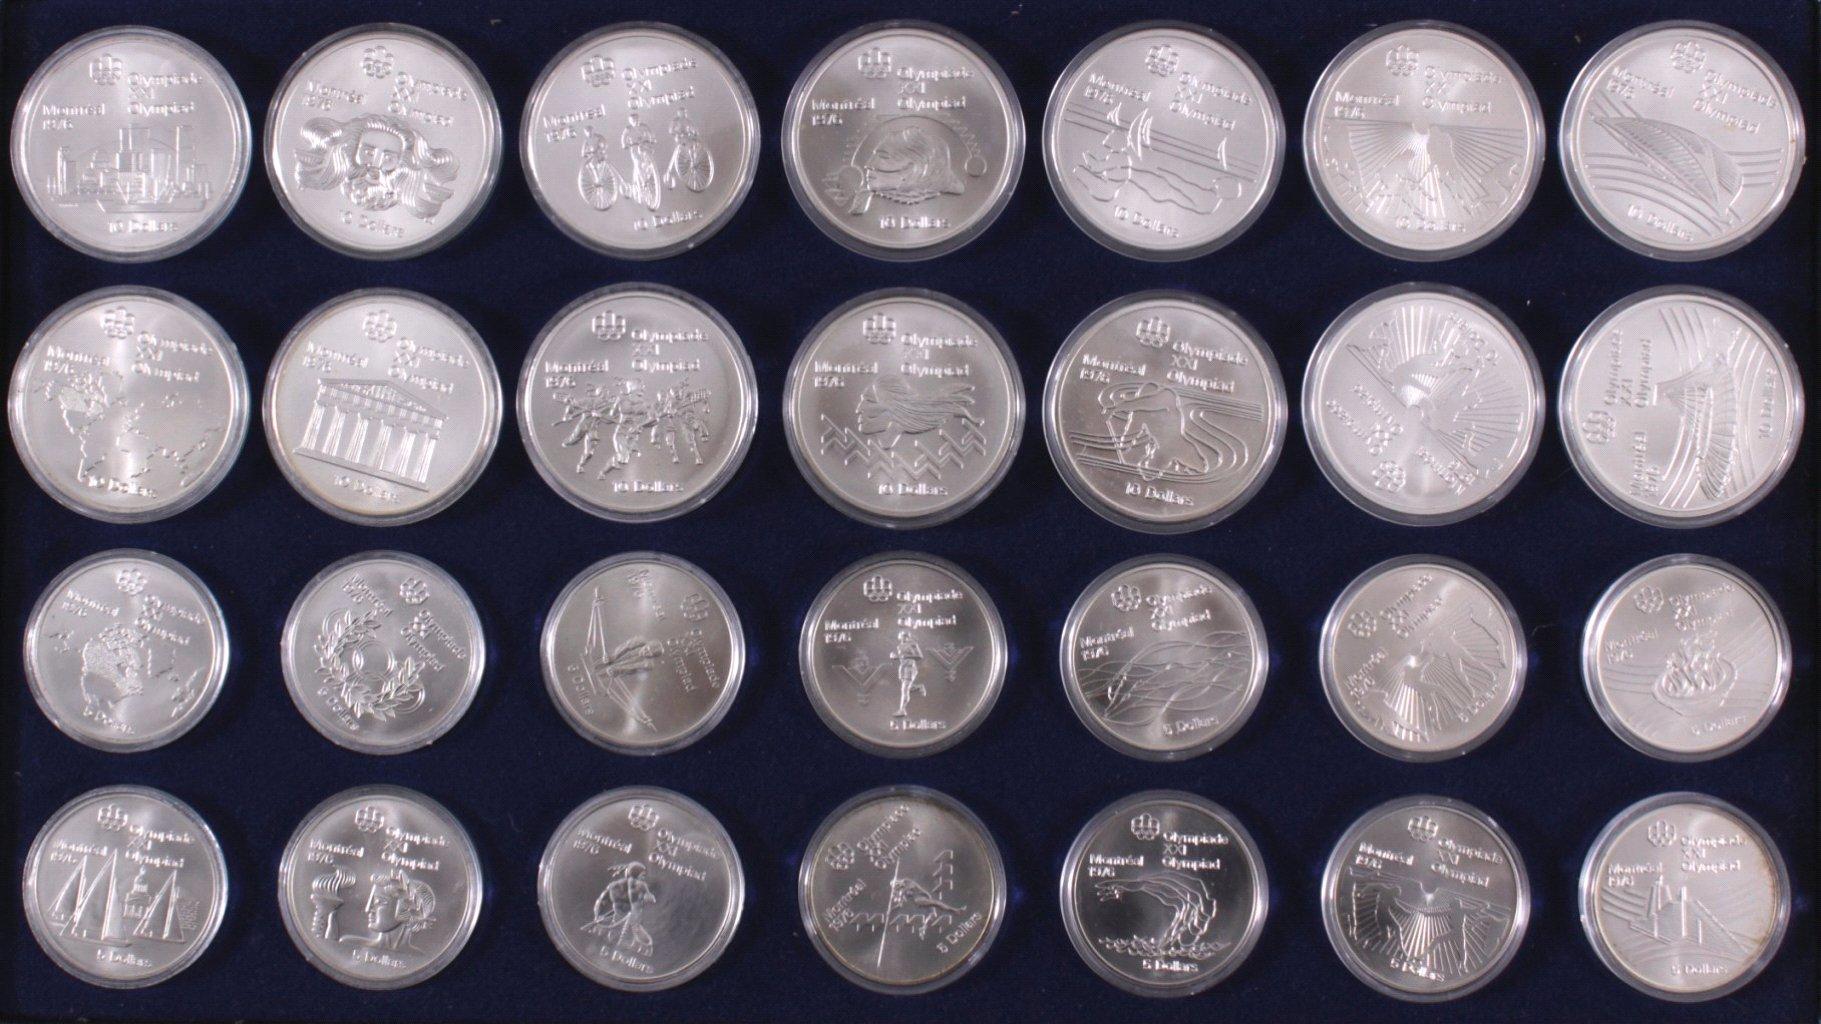 XXI. Olympiade Montreal Sammlung Silbermünzen